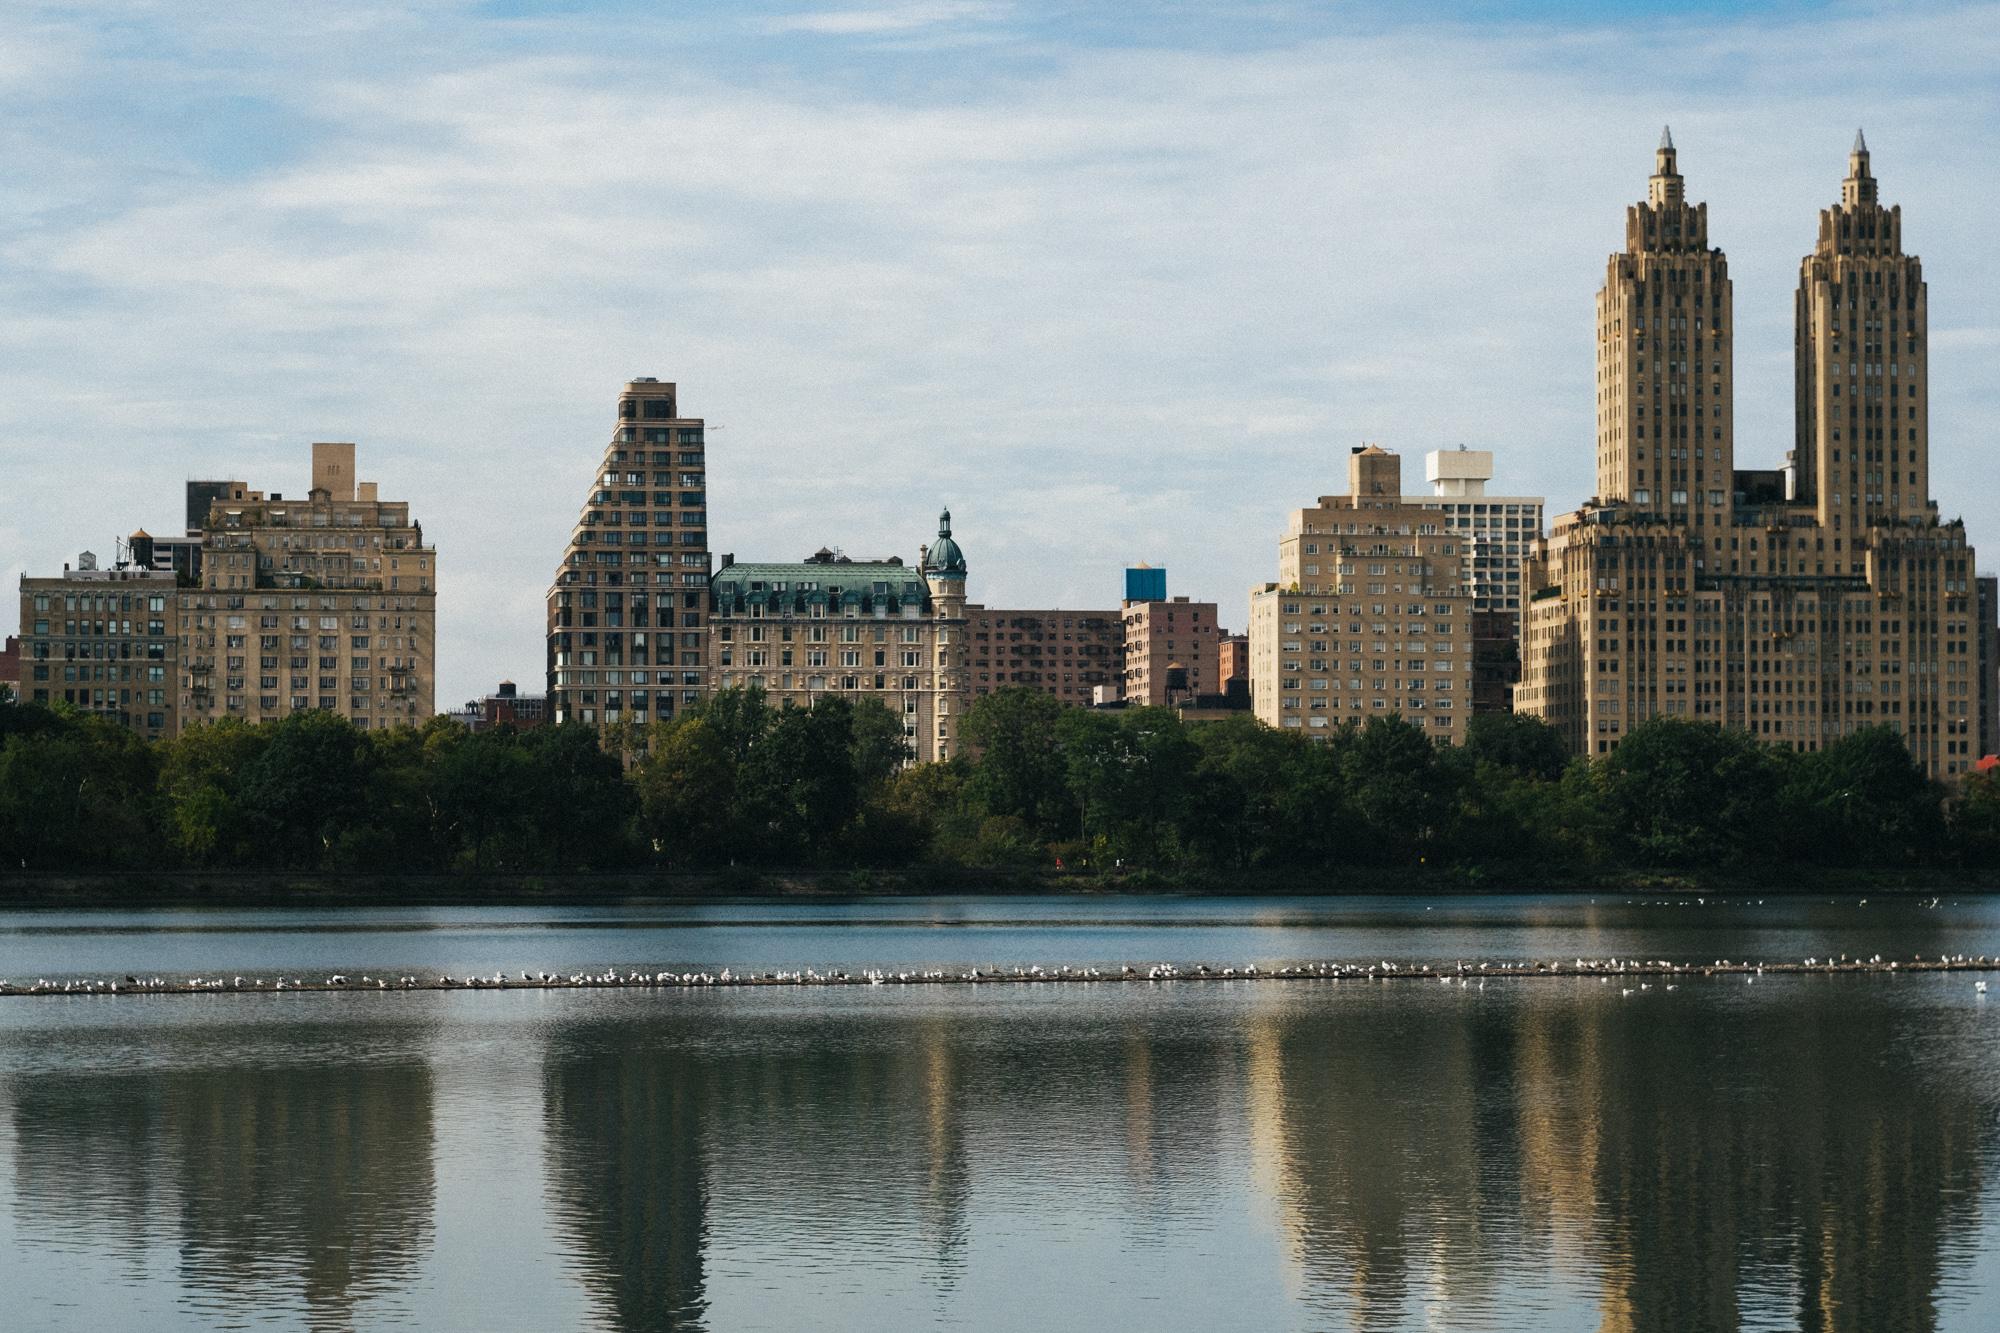 The Upper West Side of Manhattan. Fuji X-Pro 2, Helios 44-4.